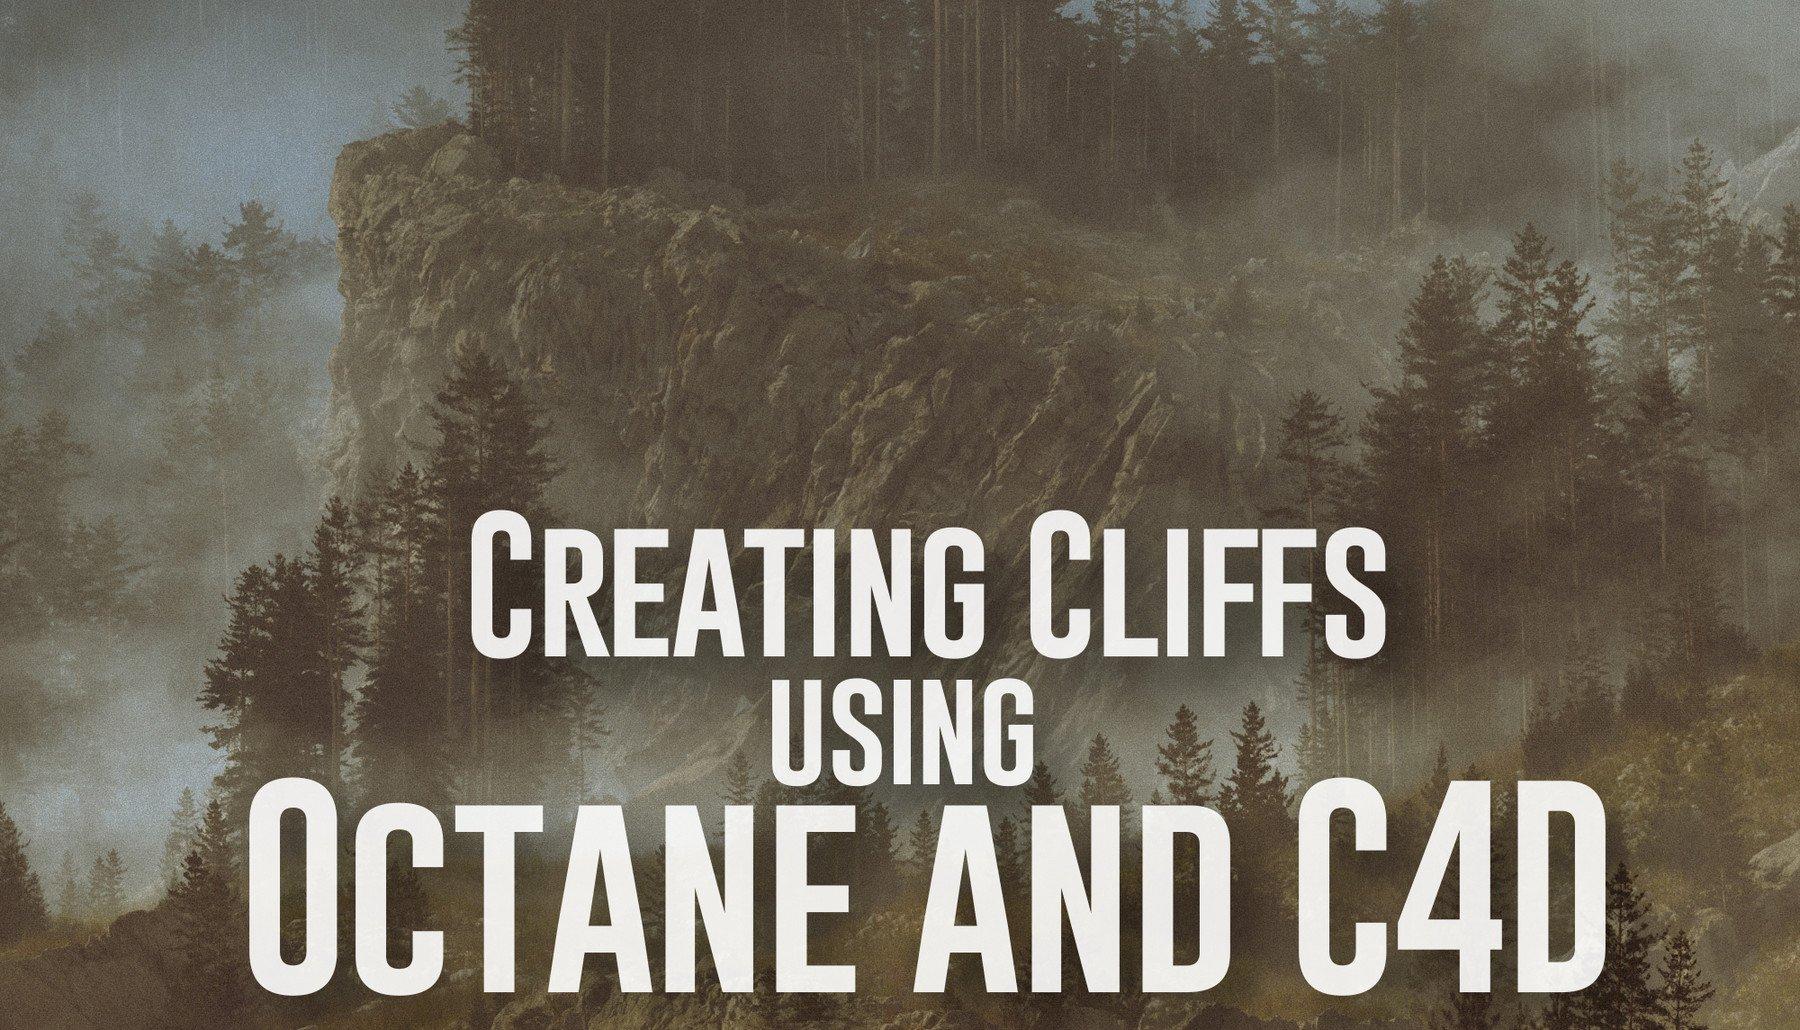 C4素材网-C4D教程-悬崖场景创作